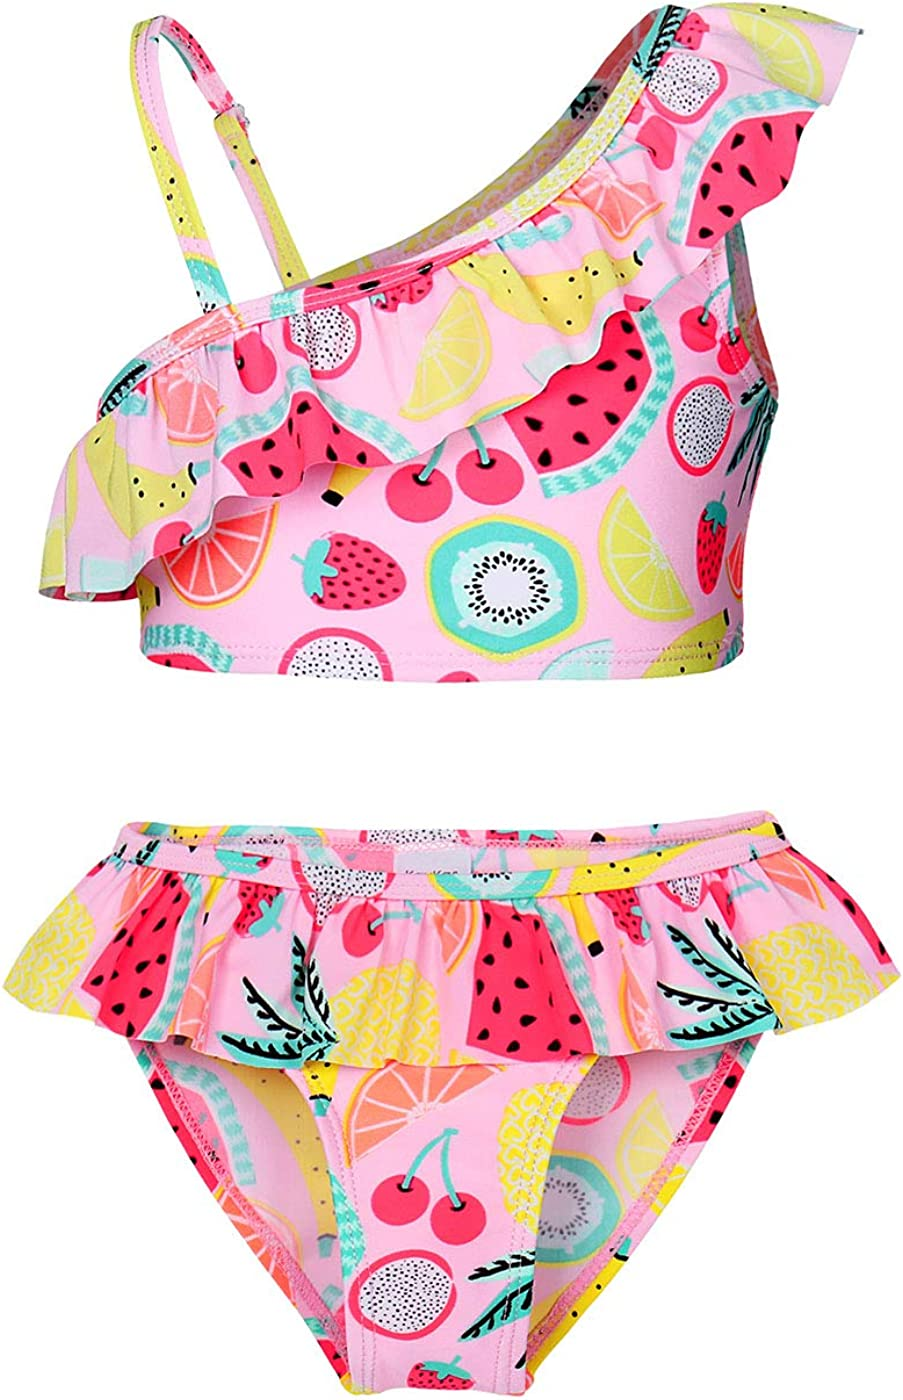 Kantenia Unicorn Swimsuit Girls Rainbow Two Pieces Swimwear Bathing Suit Bikinis Set